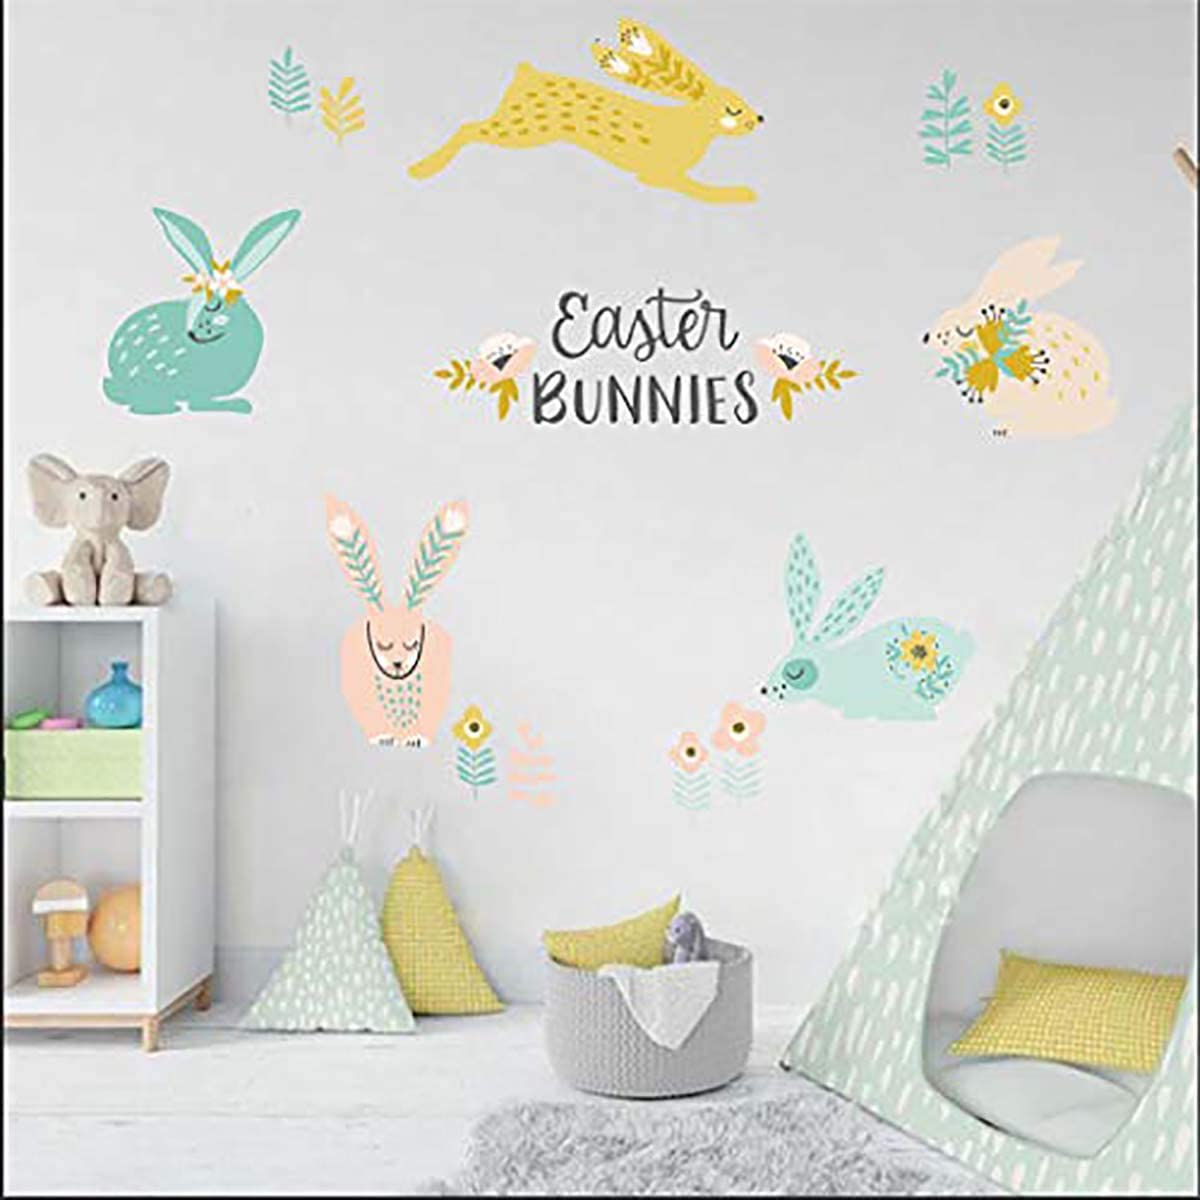 BUCKOO Easter Animal Rabbit Wall Sticker, DIY Vinyl Removable Wall Stickers,Nursery Kid Room Playroom Decor,Non-Toxic, Removable, Respositionable